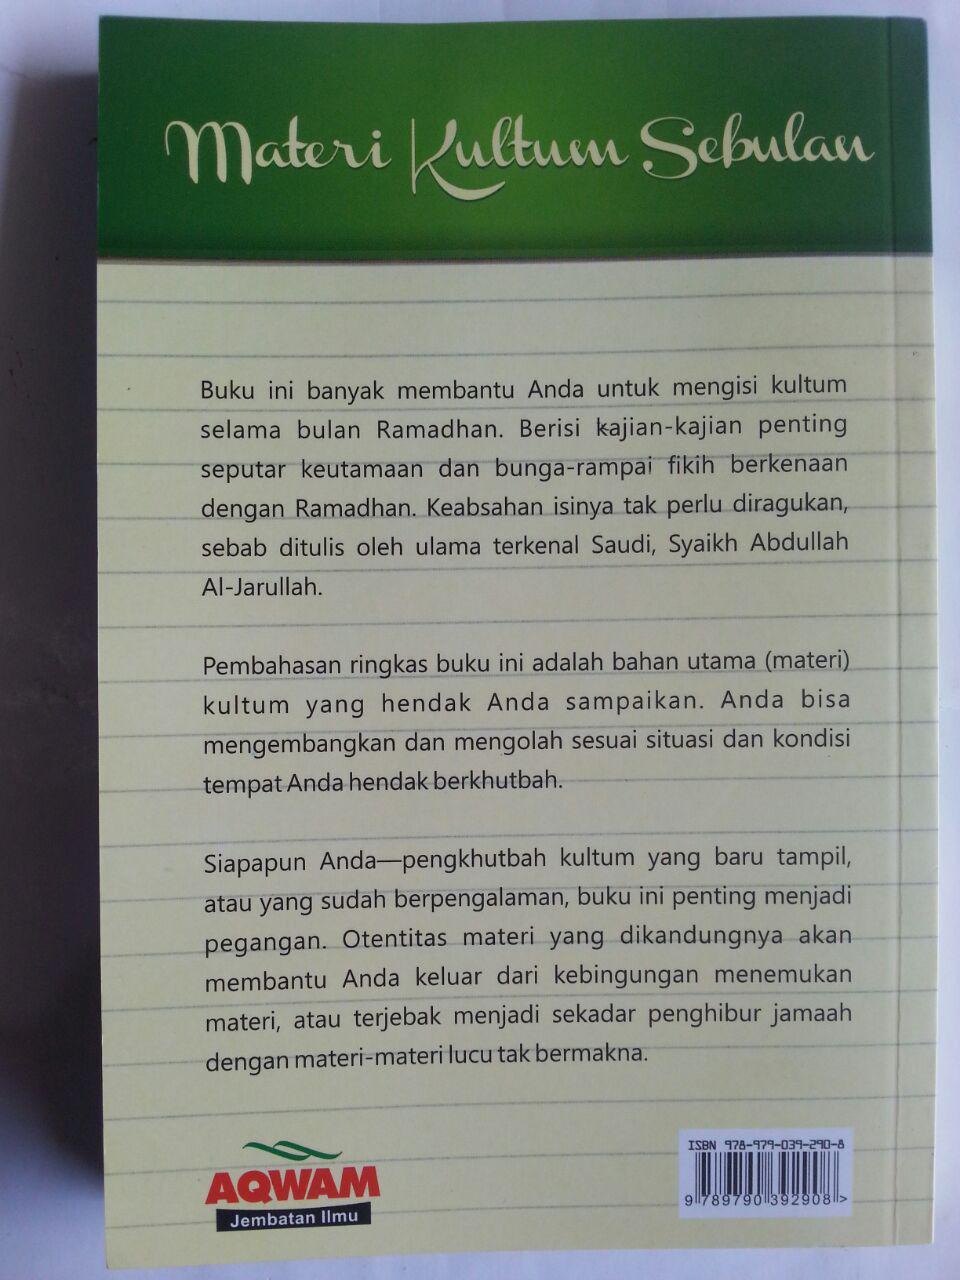 Buku Risalah Ramadhan Materi Kultum Sebulan cover